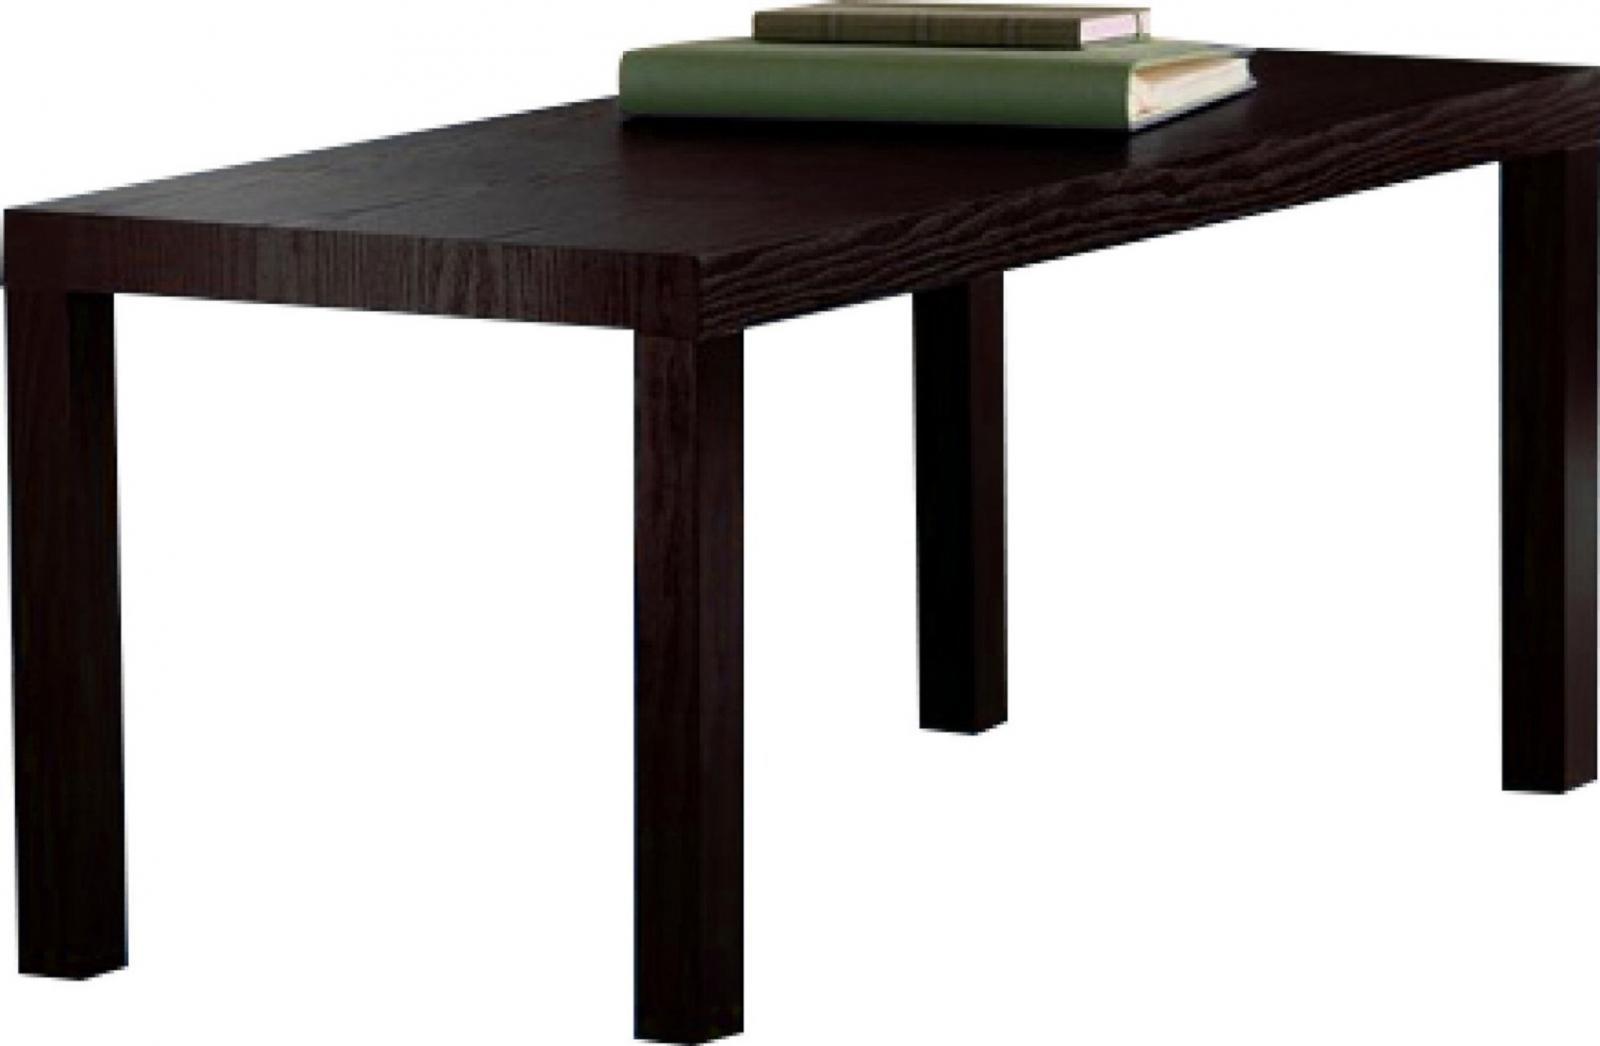 New Durable Modern Coffee Table Easy Assemble Dark Espresso Wood Grain Finish Ebay